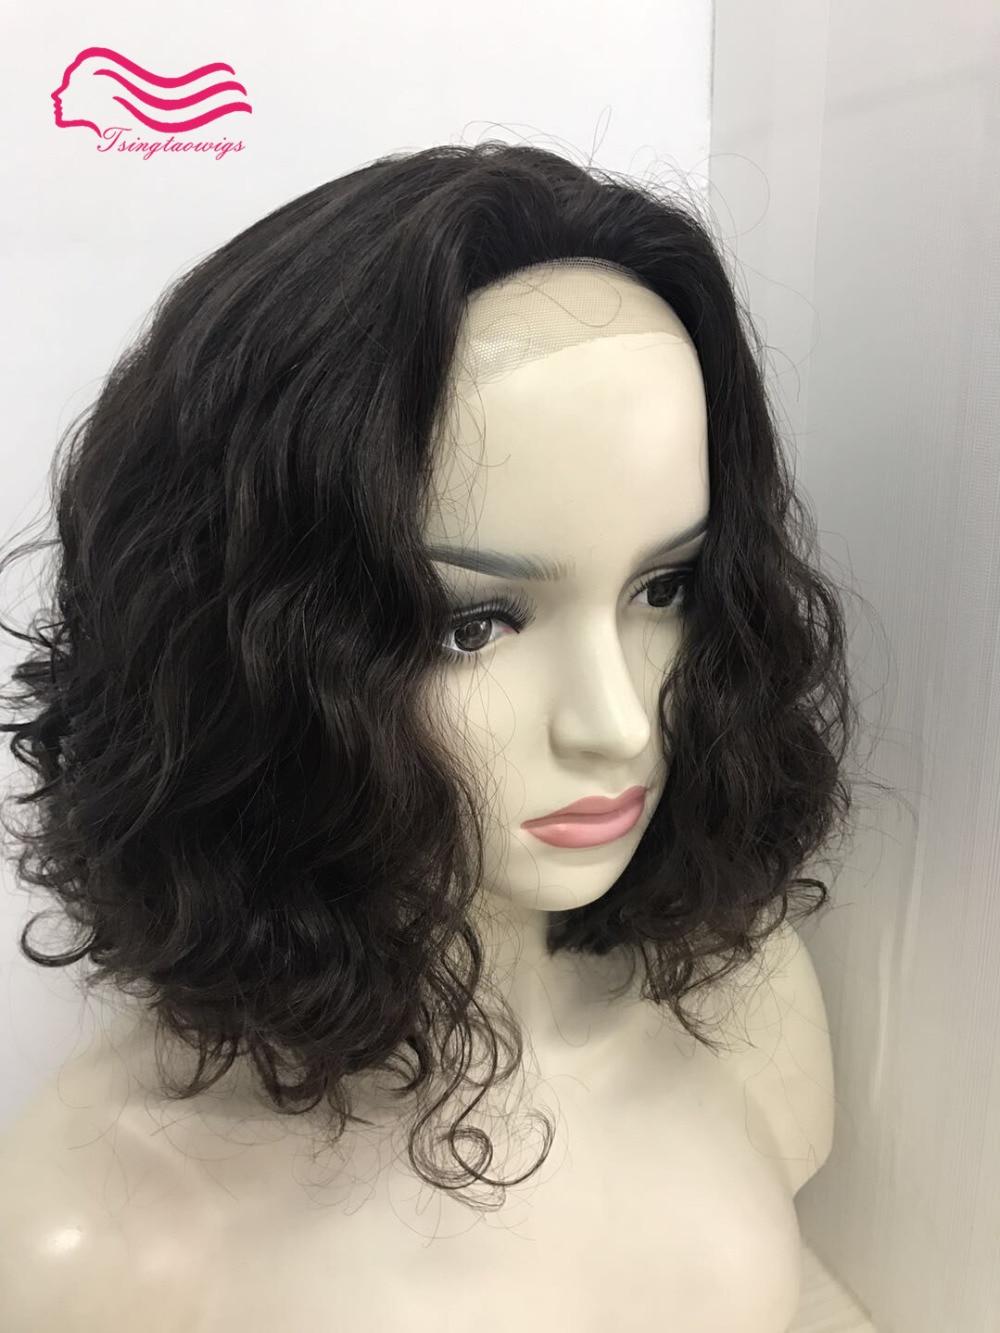 Tsingtaowigs slight layer front lace kosher wig 100 European virgin hair jewish wig kosher wig Best